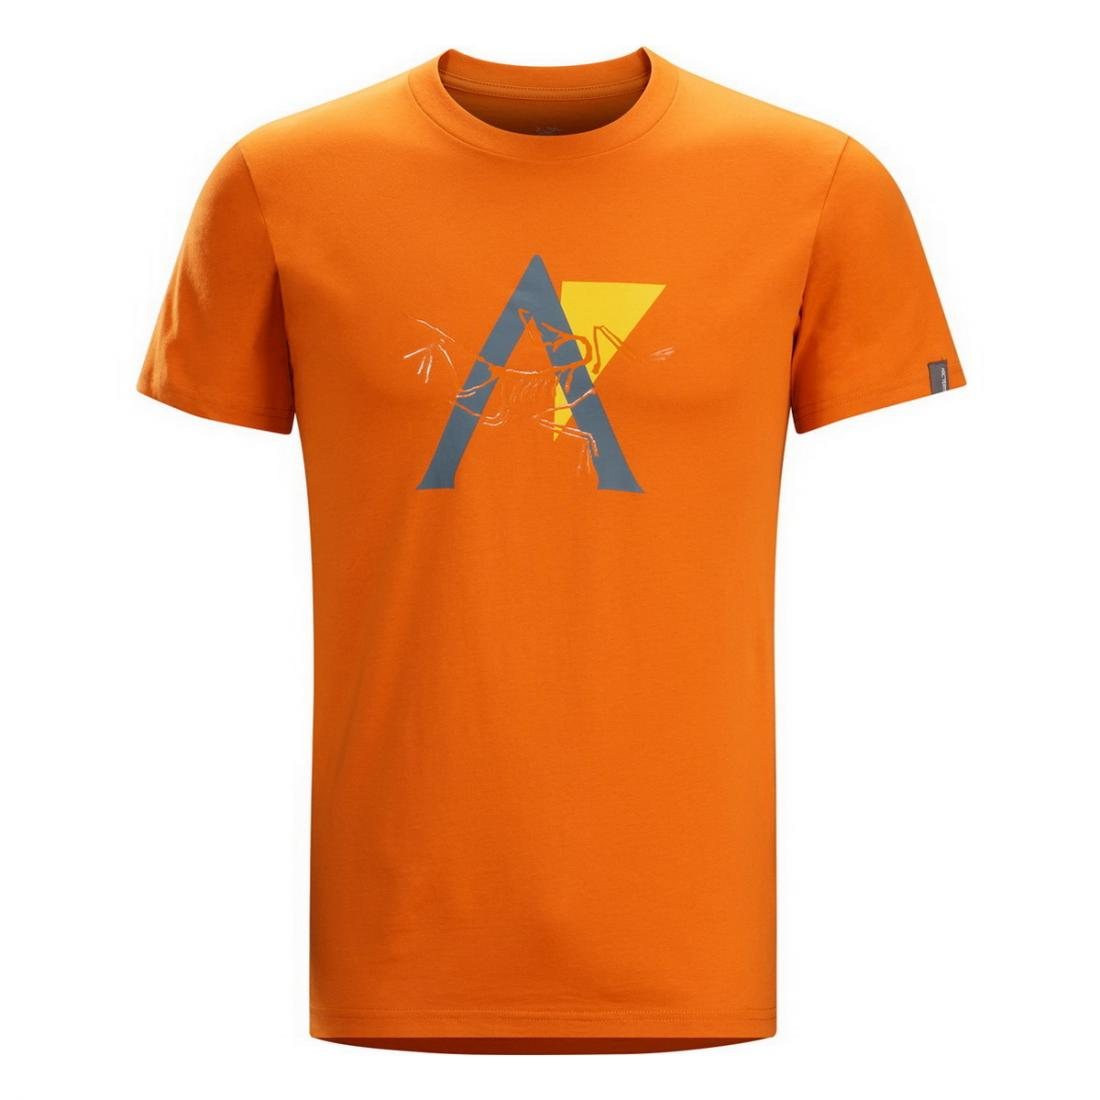 Футболка Stack SS T-Shirt муж.Футболки, поло<br><br><br>Цвет: Оранжевый<br>Размер: L